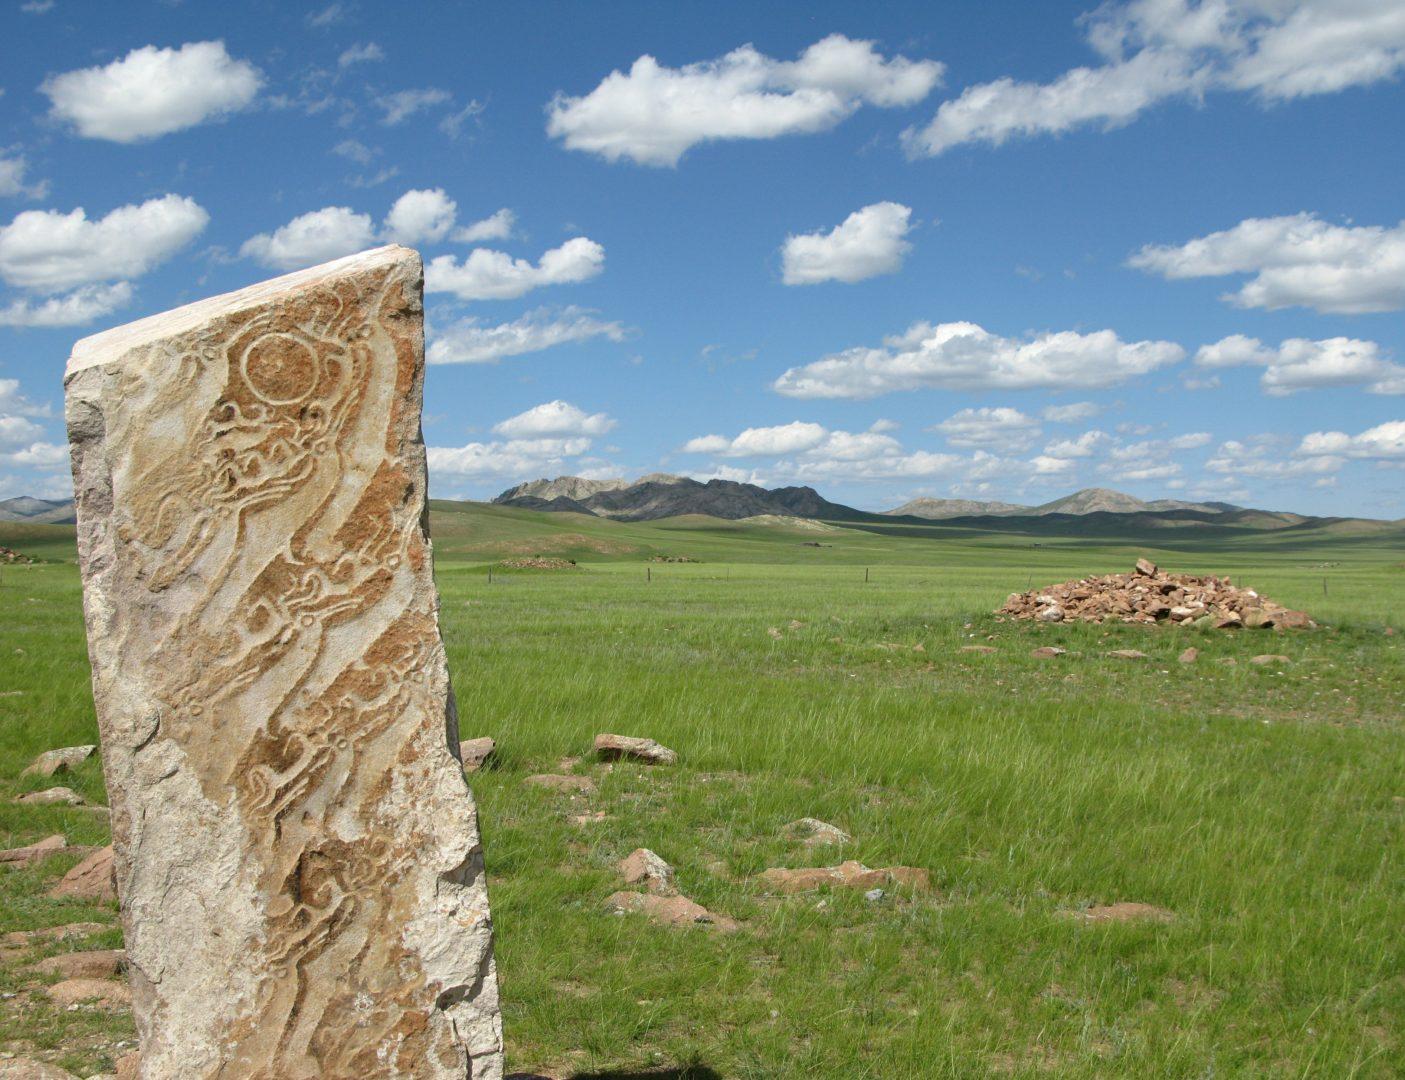 Mongolei-Reise, Steppe und Taiga: Felsmalereien